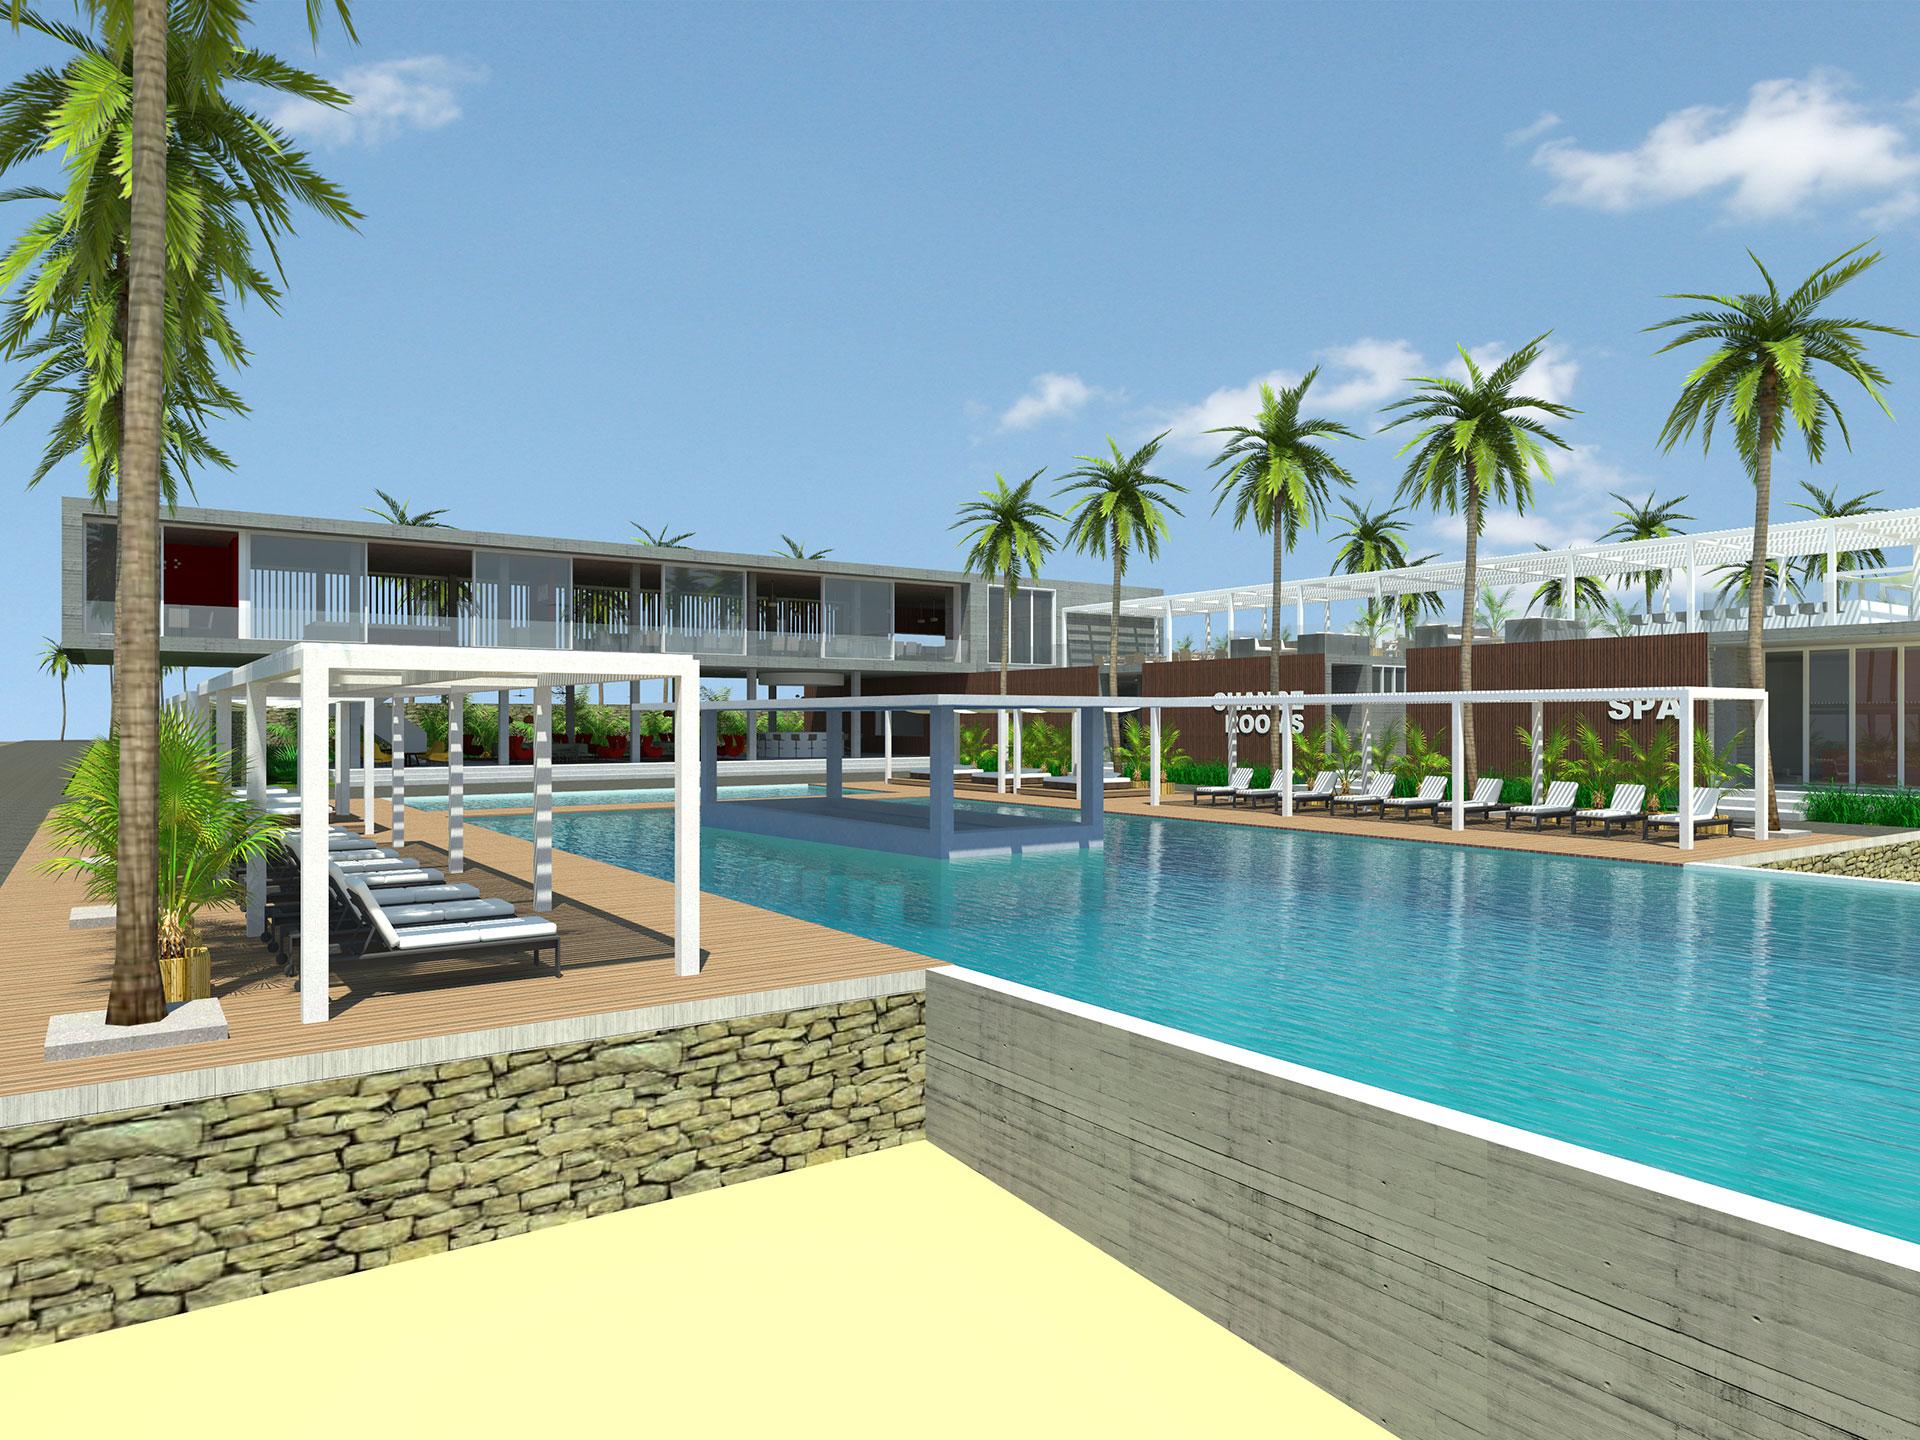 Infinity Pool & Deck